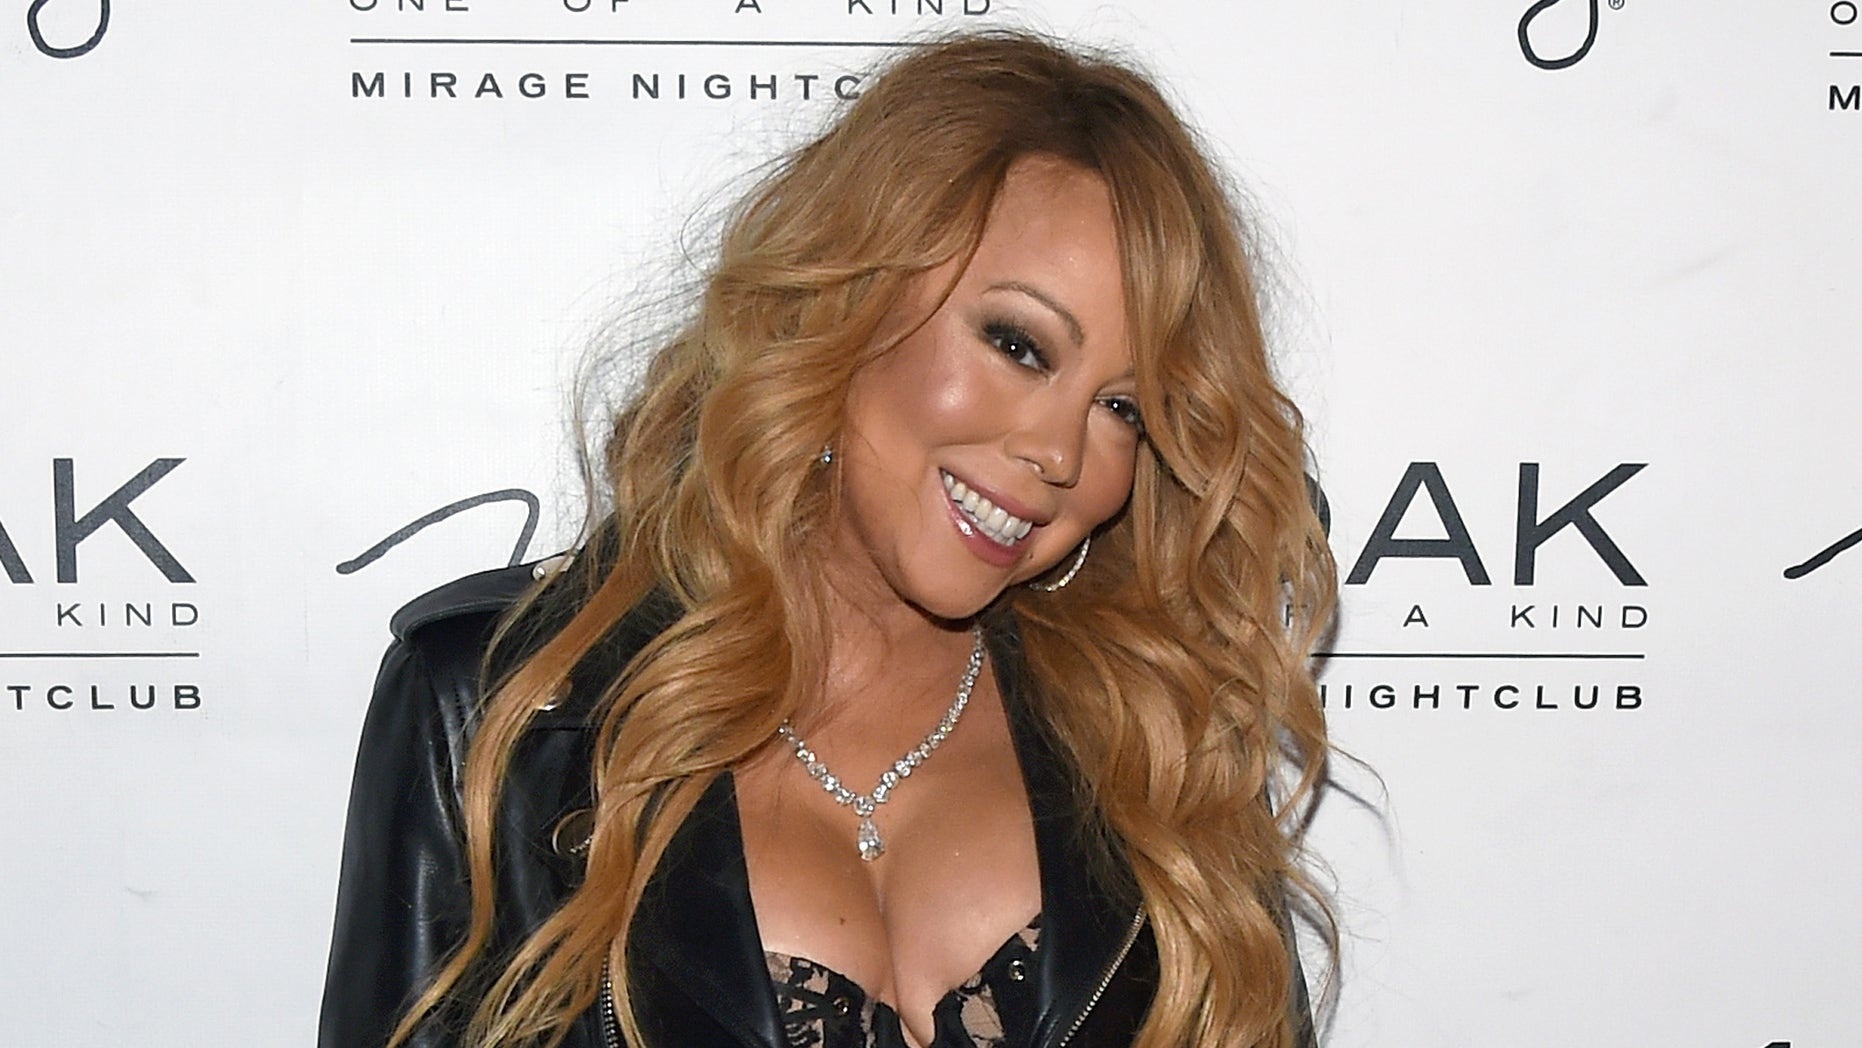 Mariah Carey on June 26, 2016 in Las Vegas, Nevada.